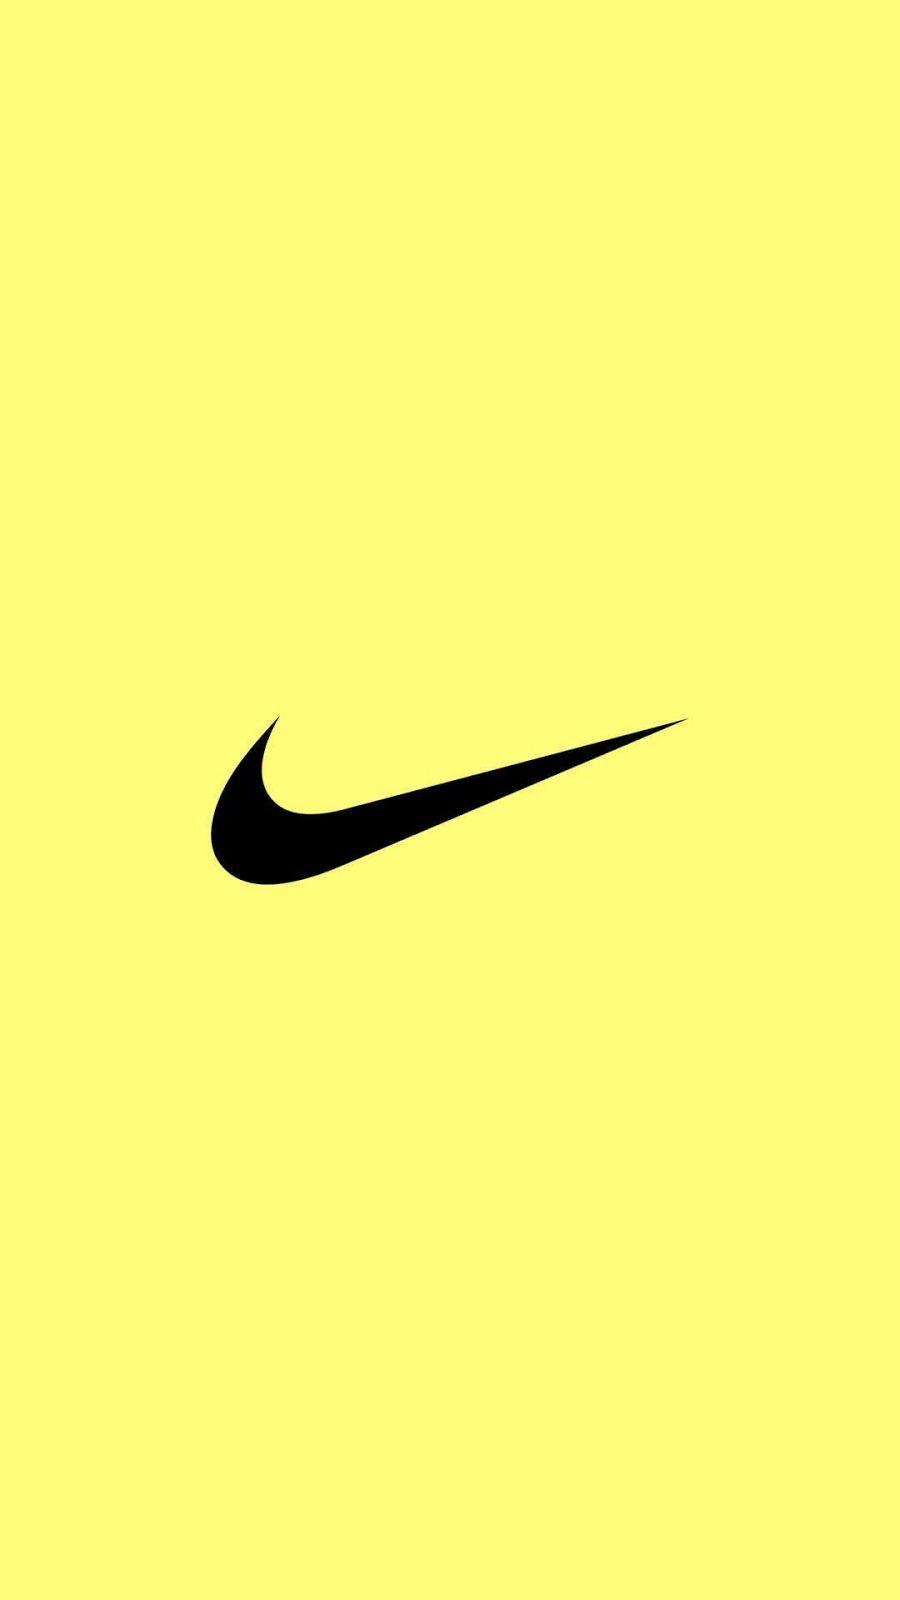 Nike Iphone Wallpapers Hd Nike Wallpaper Nike Wallpaper Iphone Nike Background